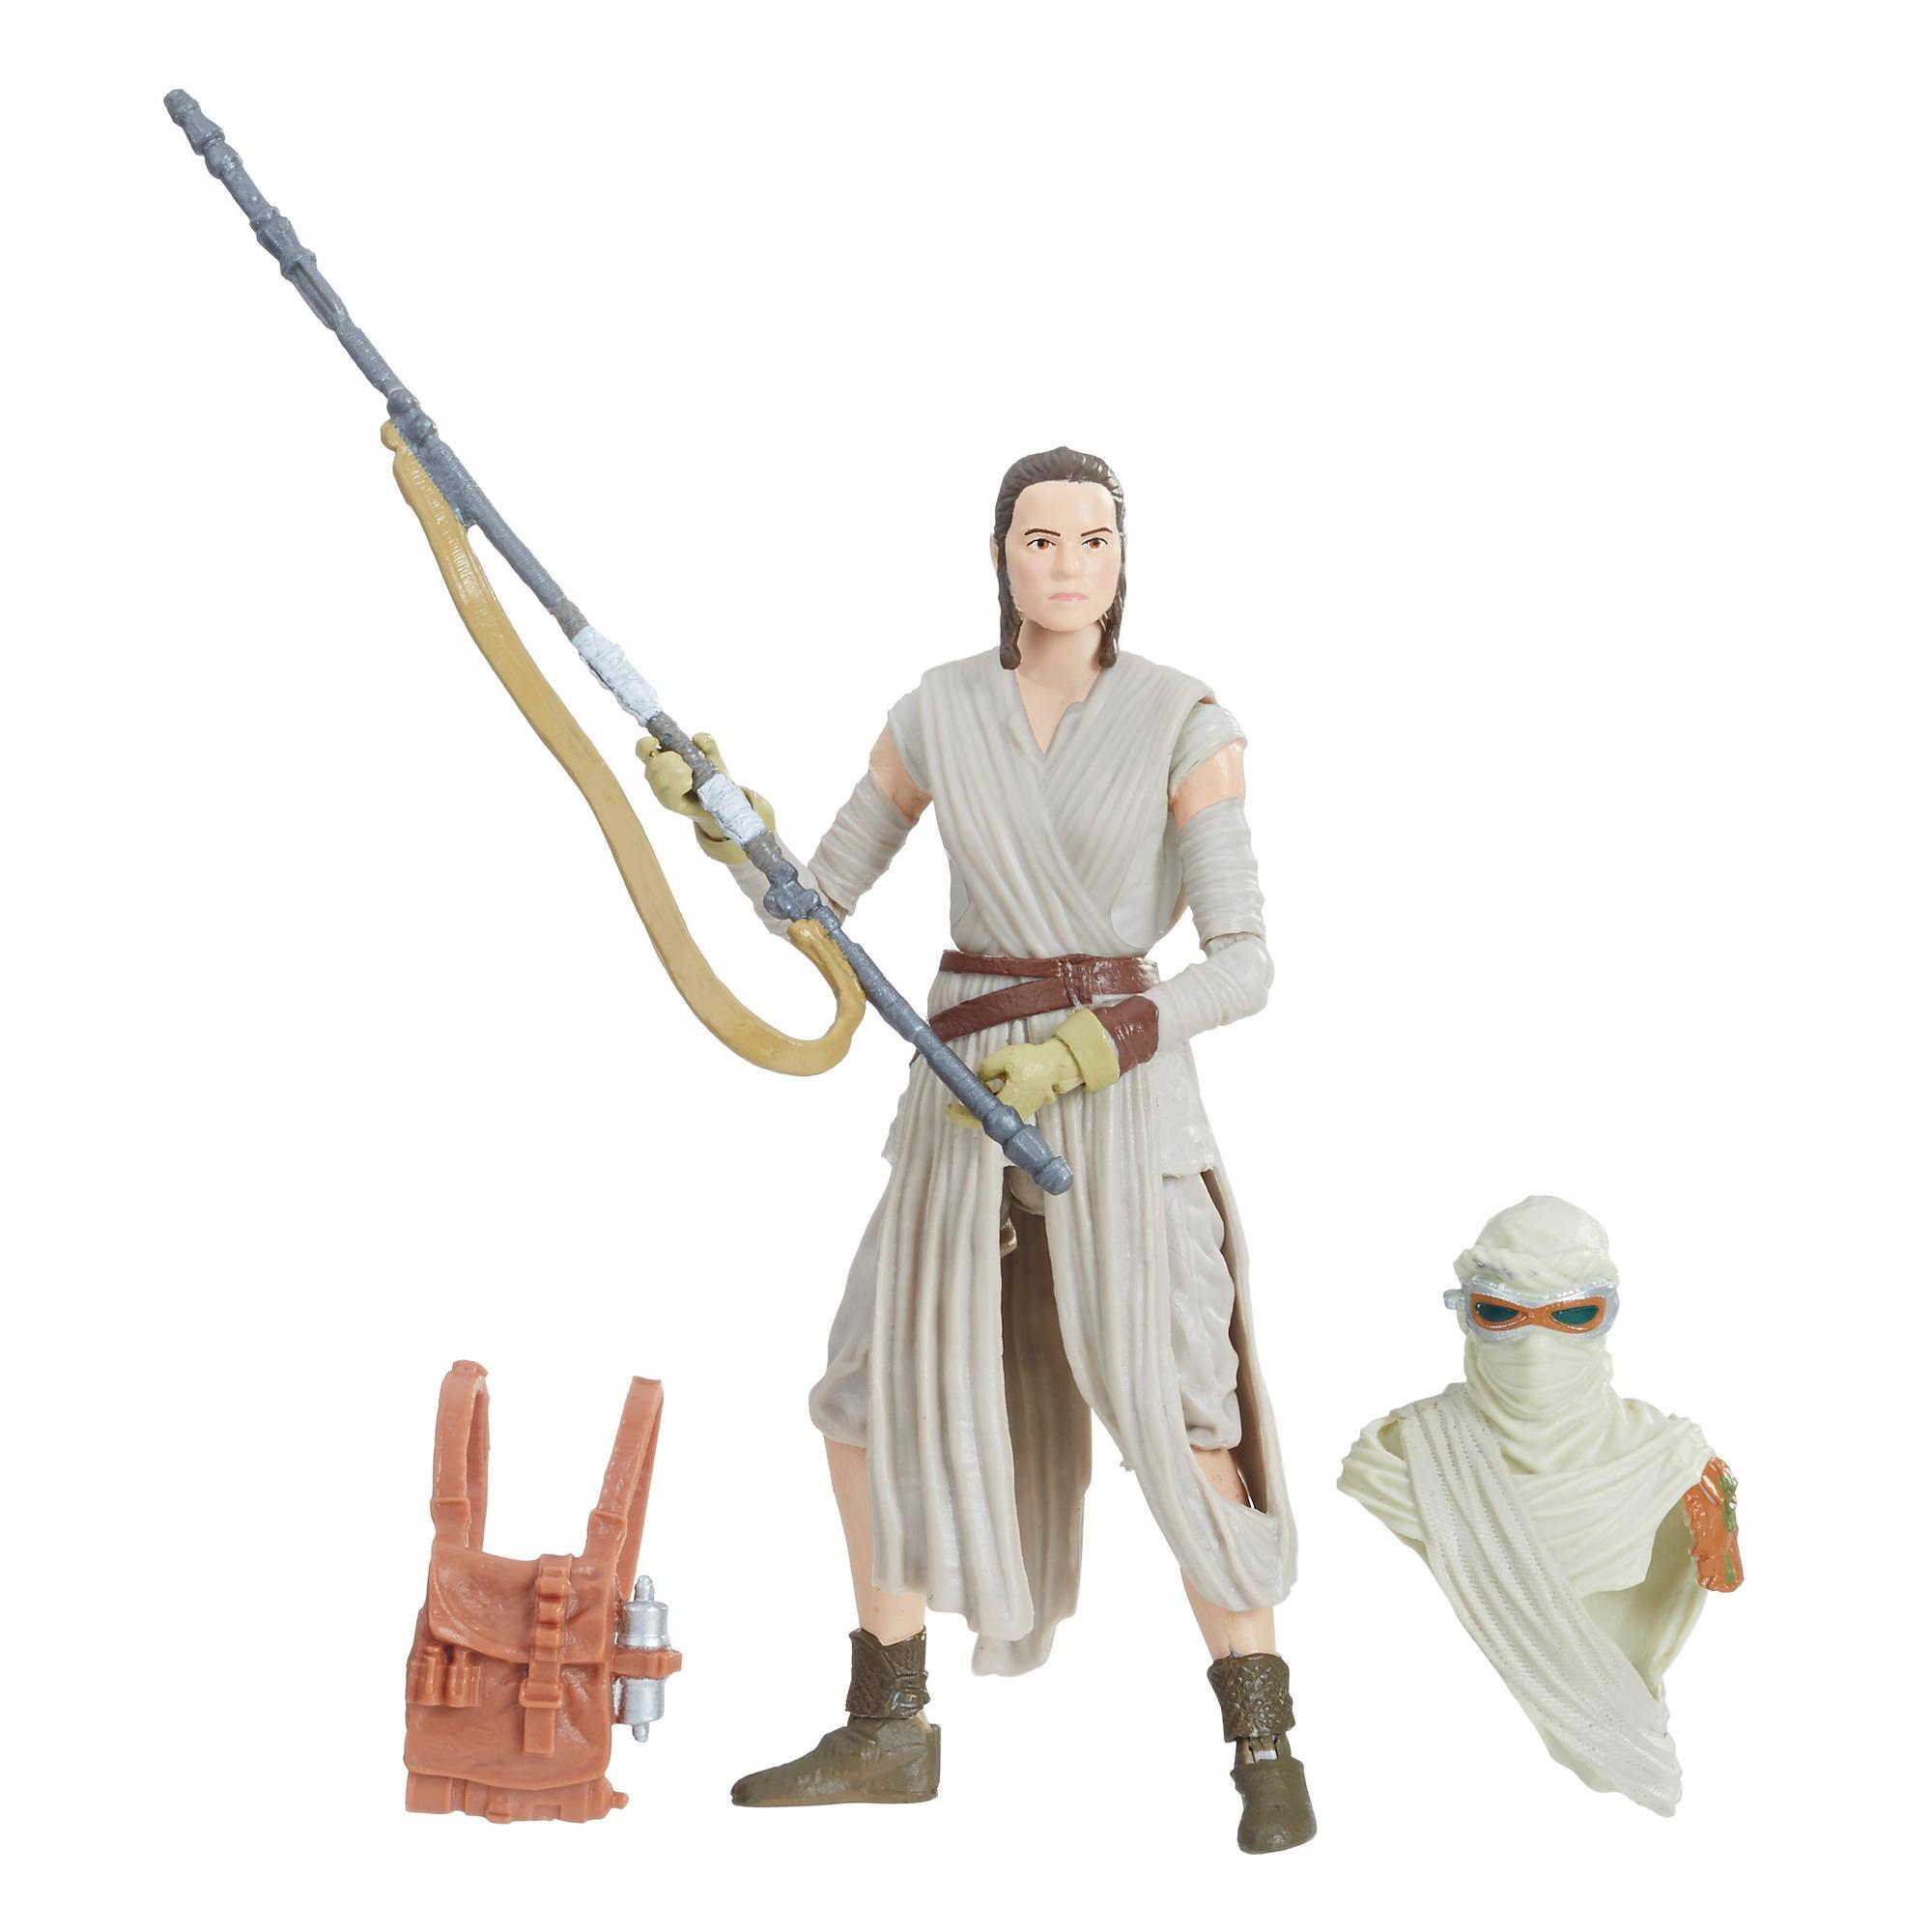 Star Wars - Collection Vintage - Figurine Rey (Jakku) de 9,5 cm